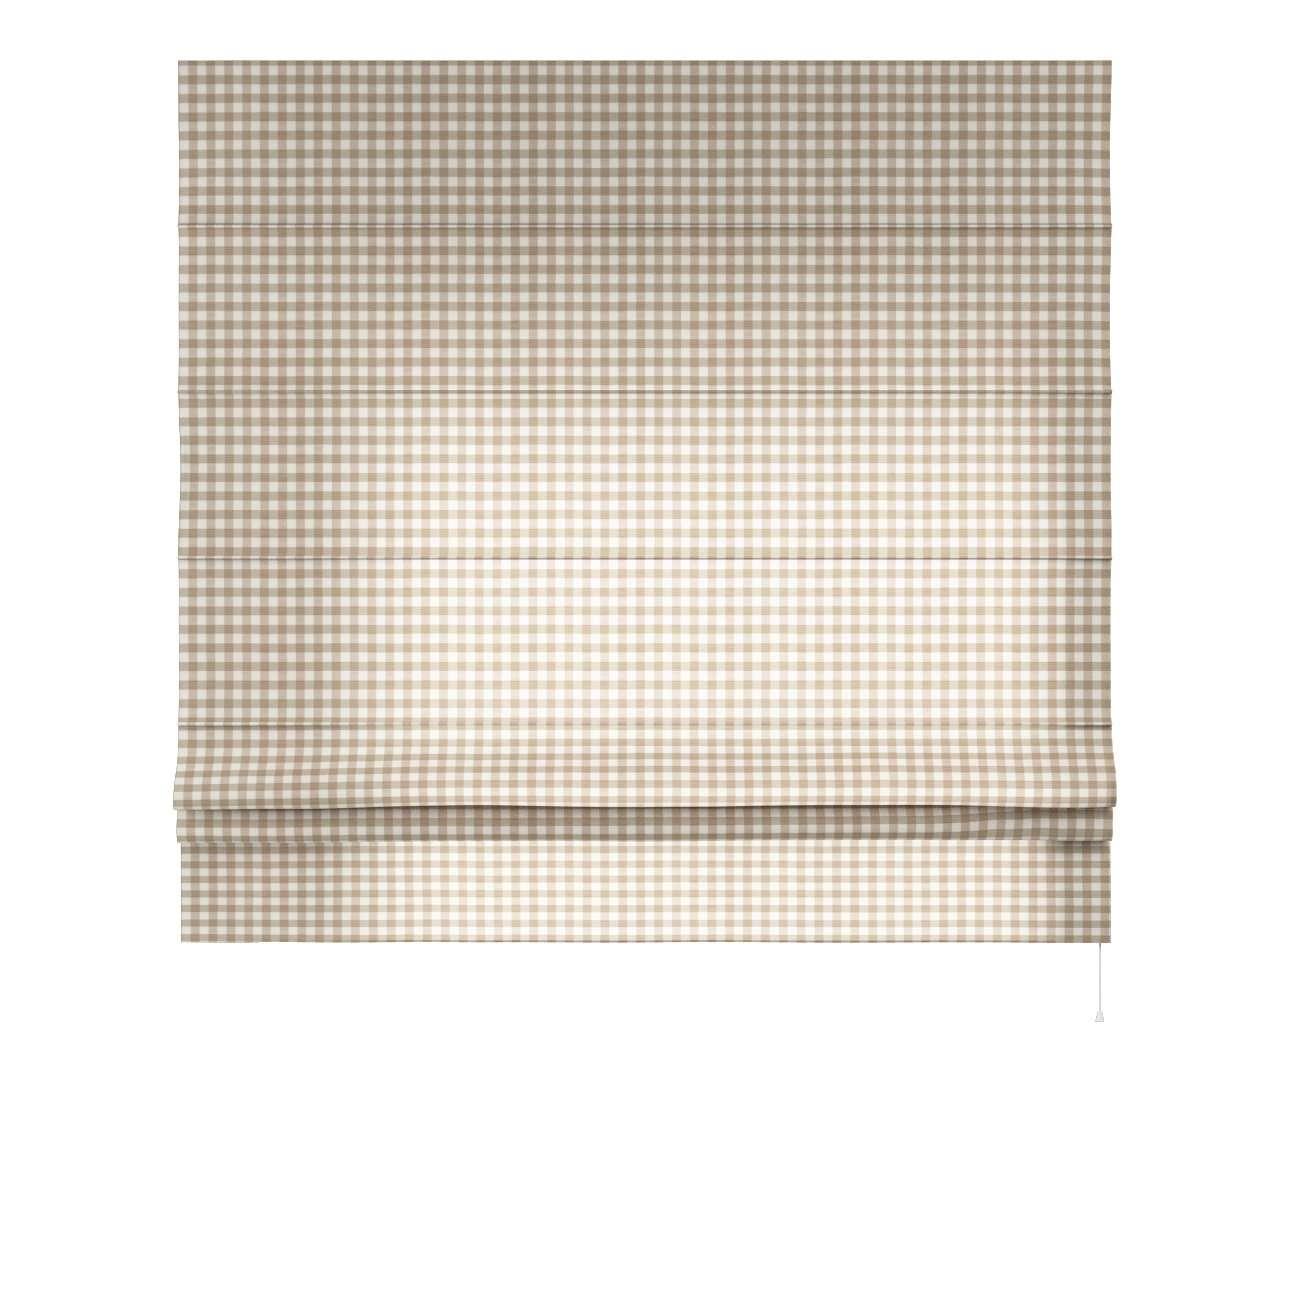 Raffrollo Padva 80 x 170 cm von der Kollektion Quadro, Stoff: 136-06